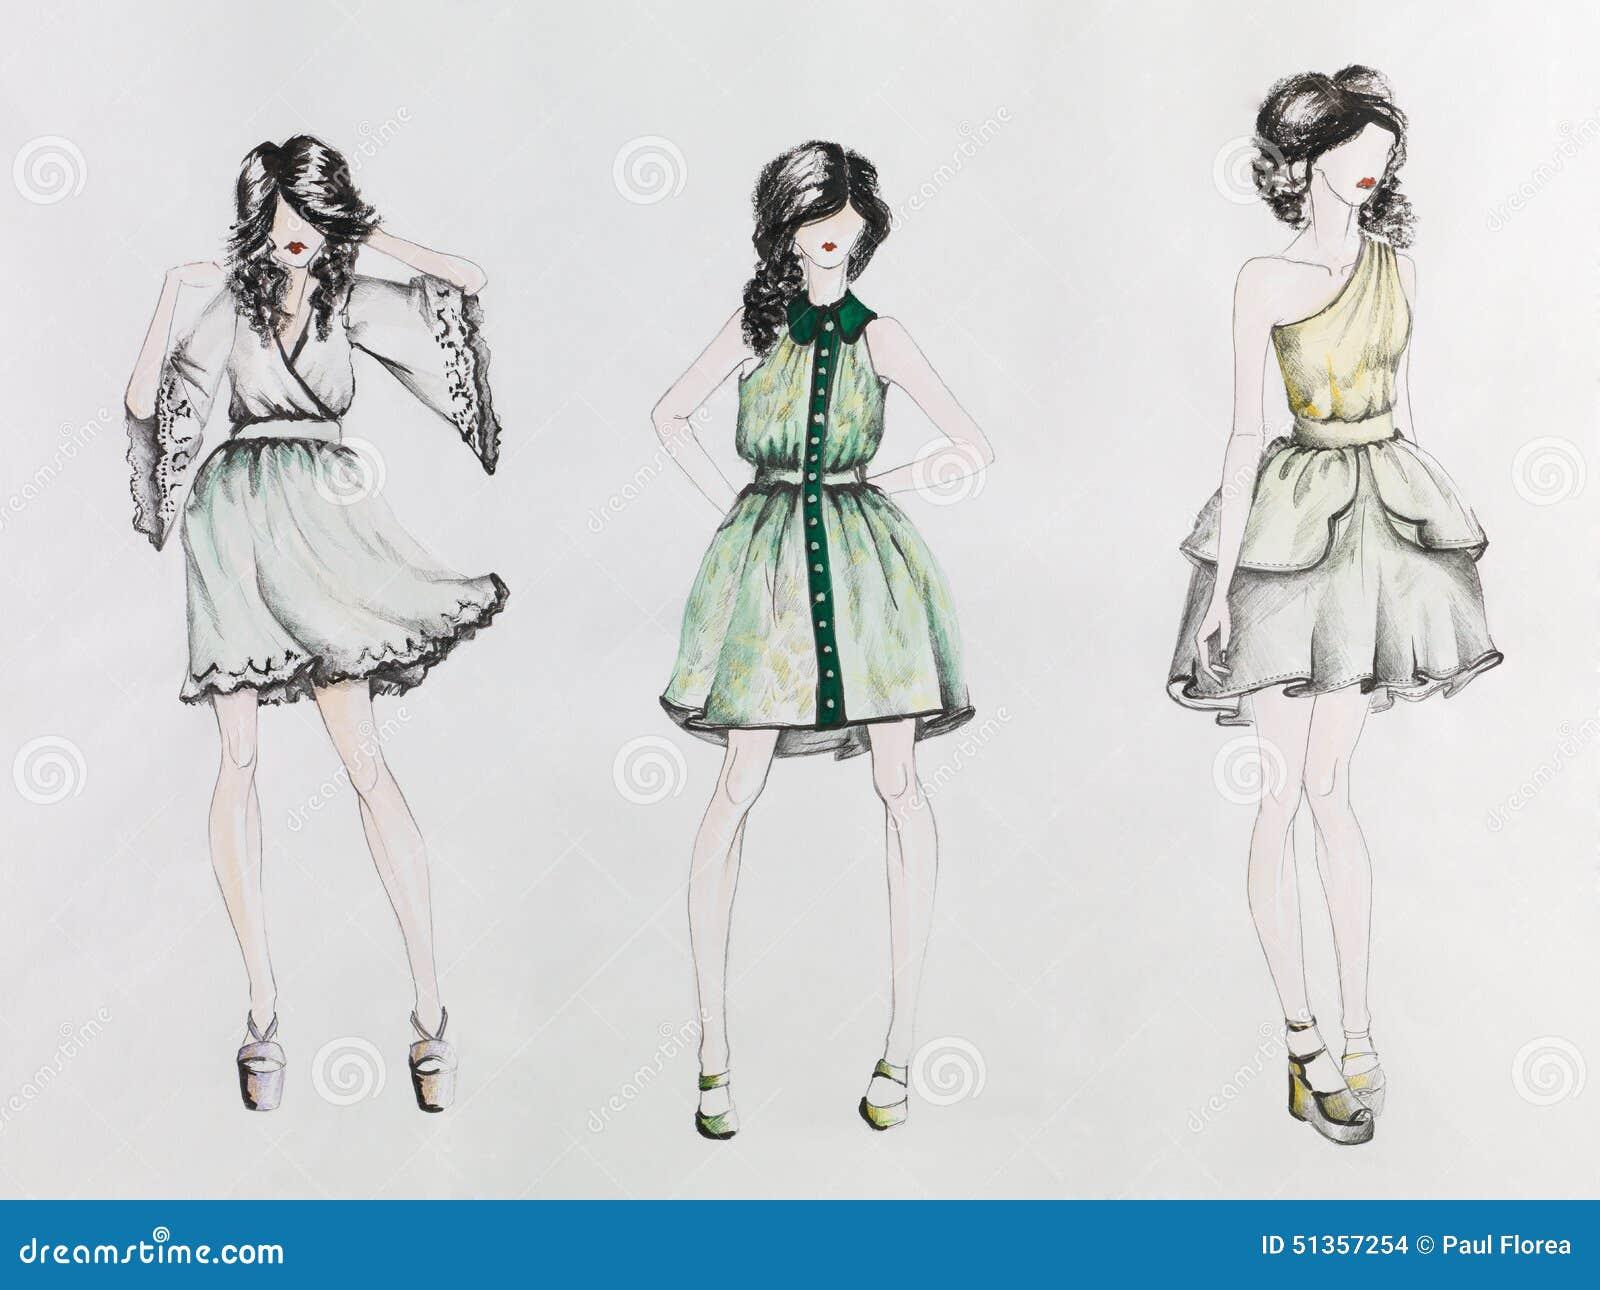 Fashion week Design Fashion sketches of short dresses for girls